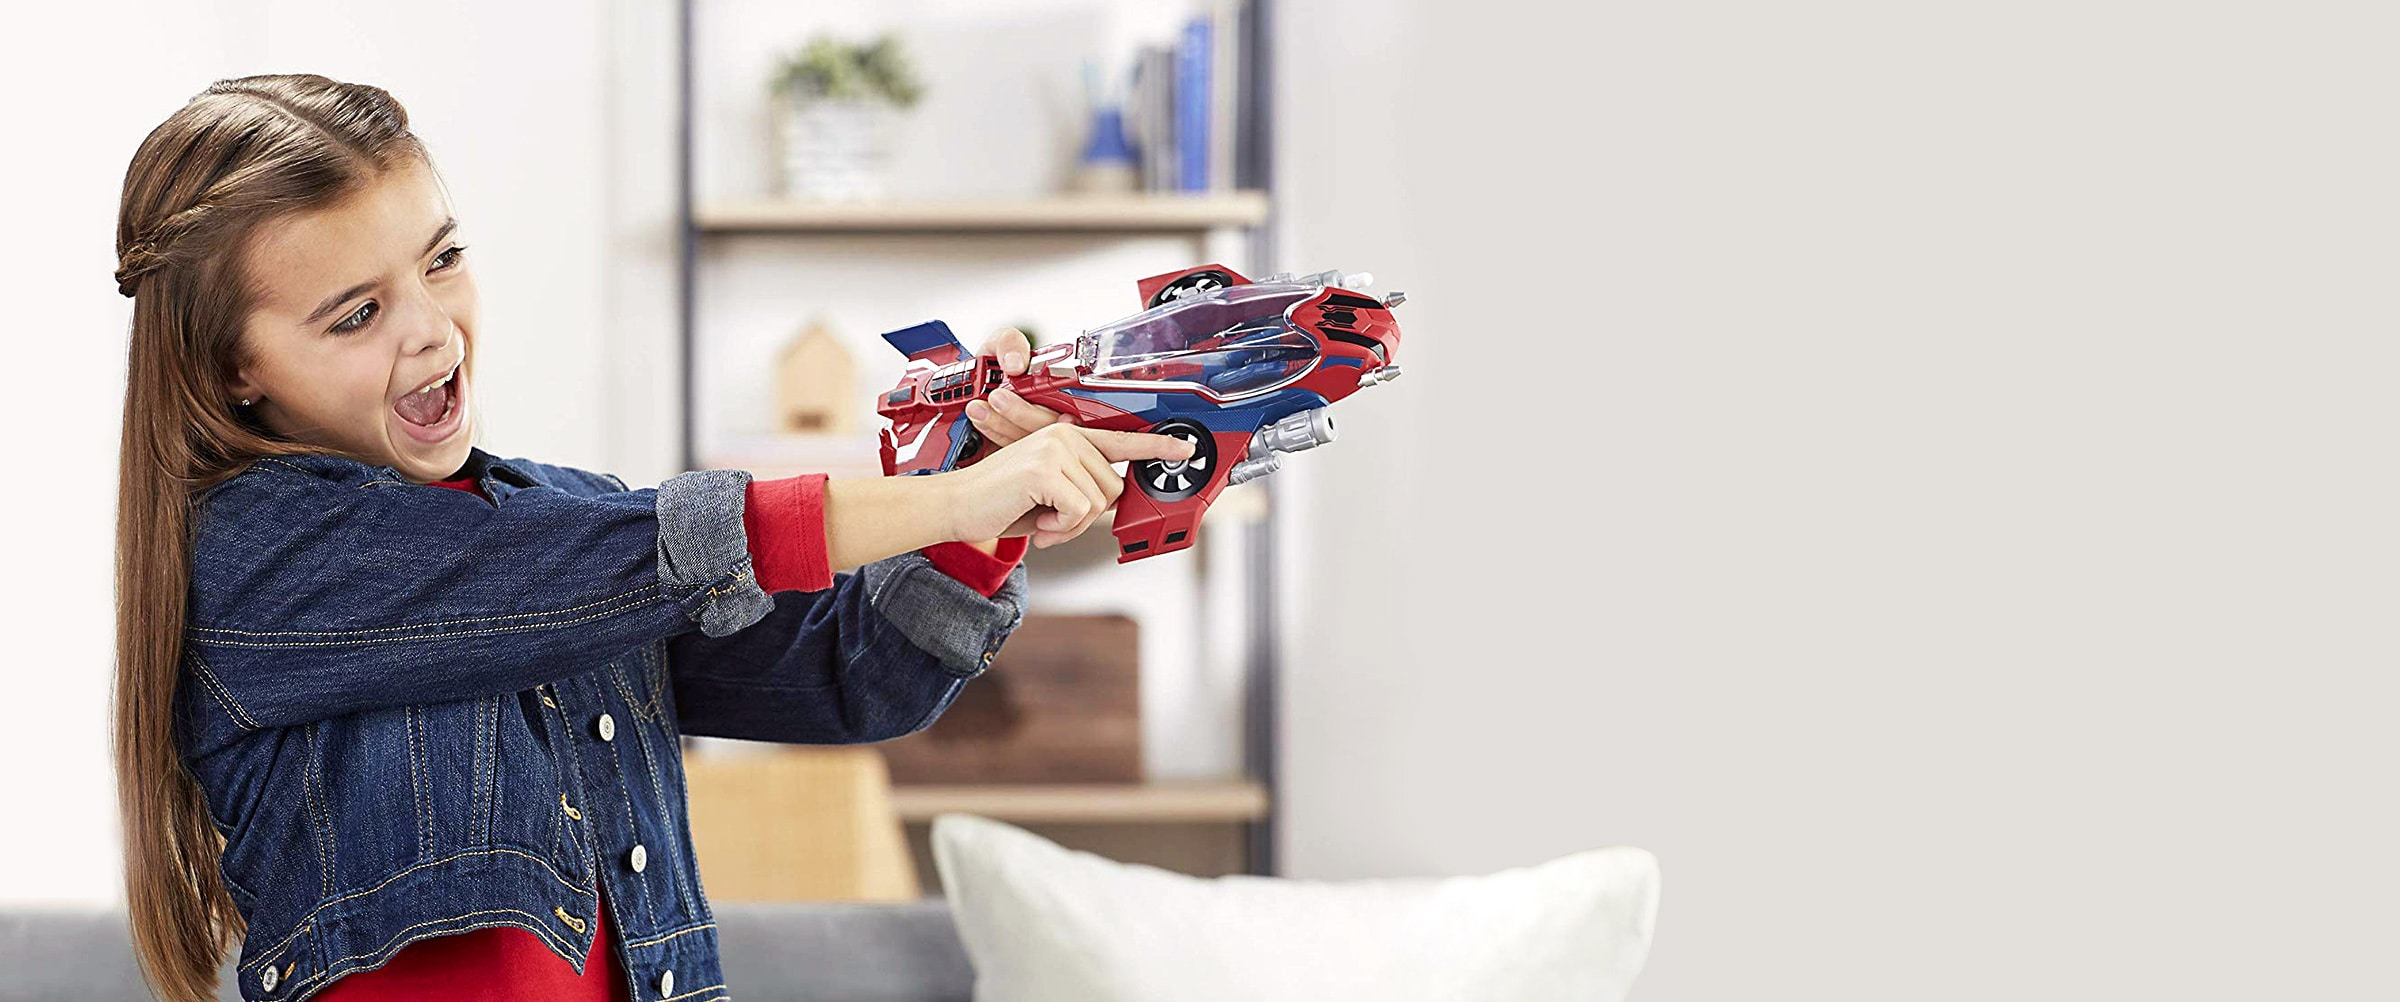 Shop   Shop Marvel   Hero   Spiderman Toys Big W